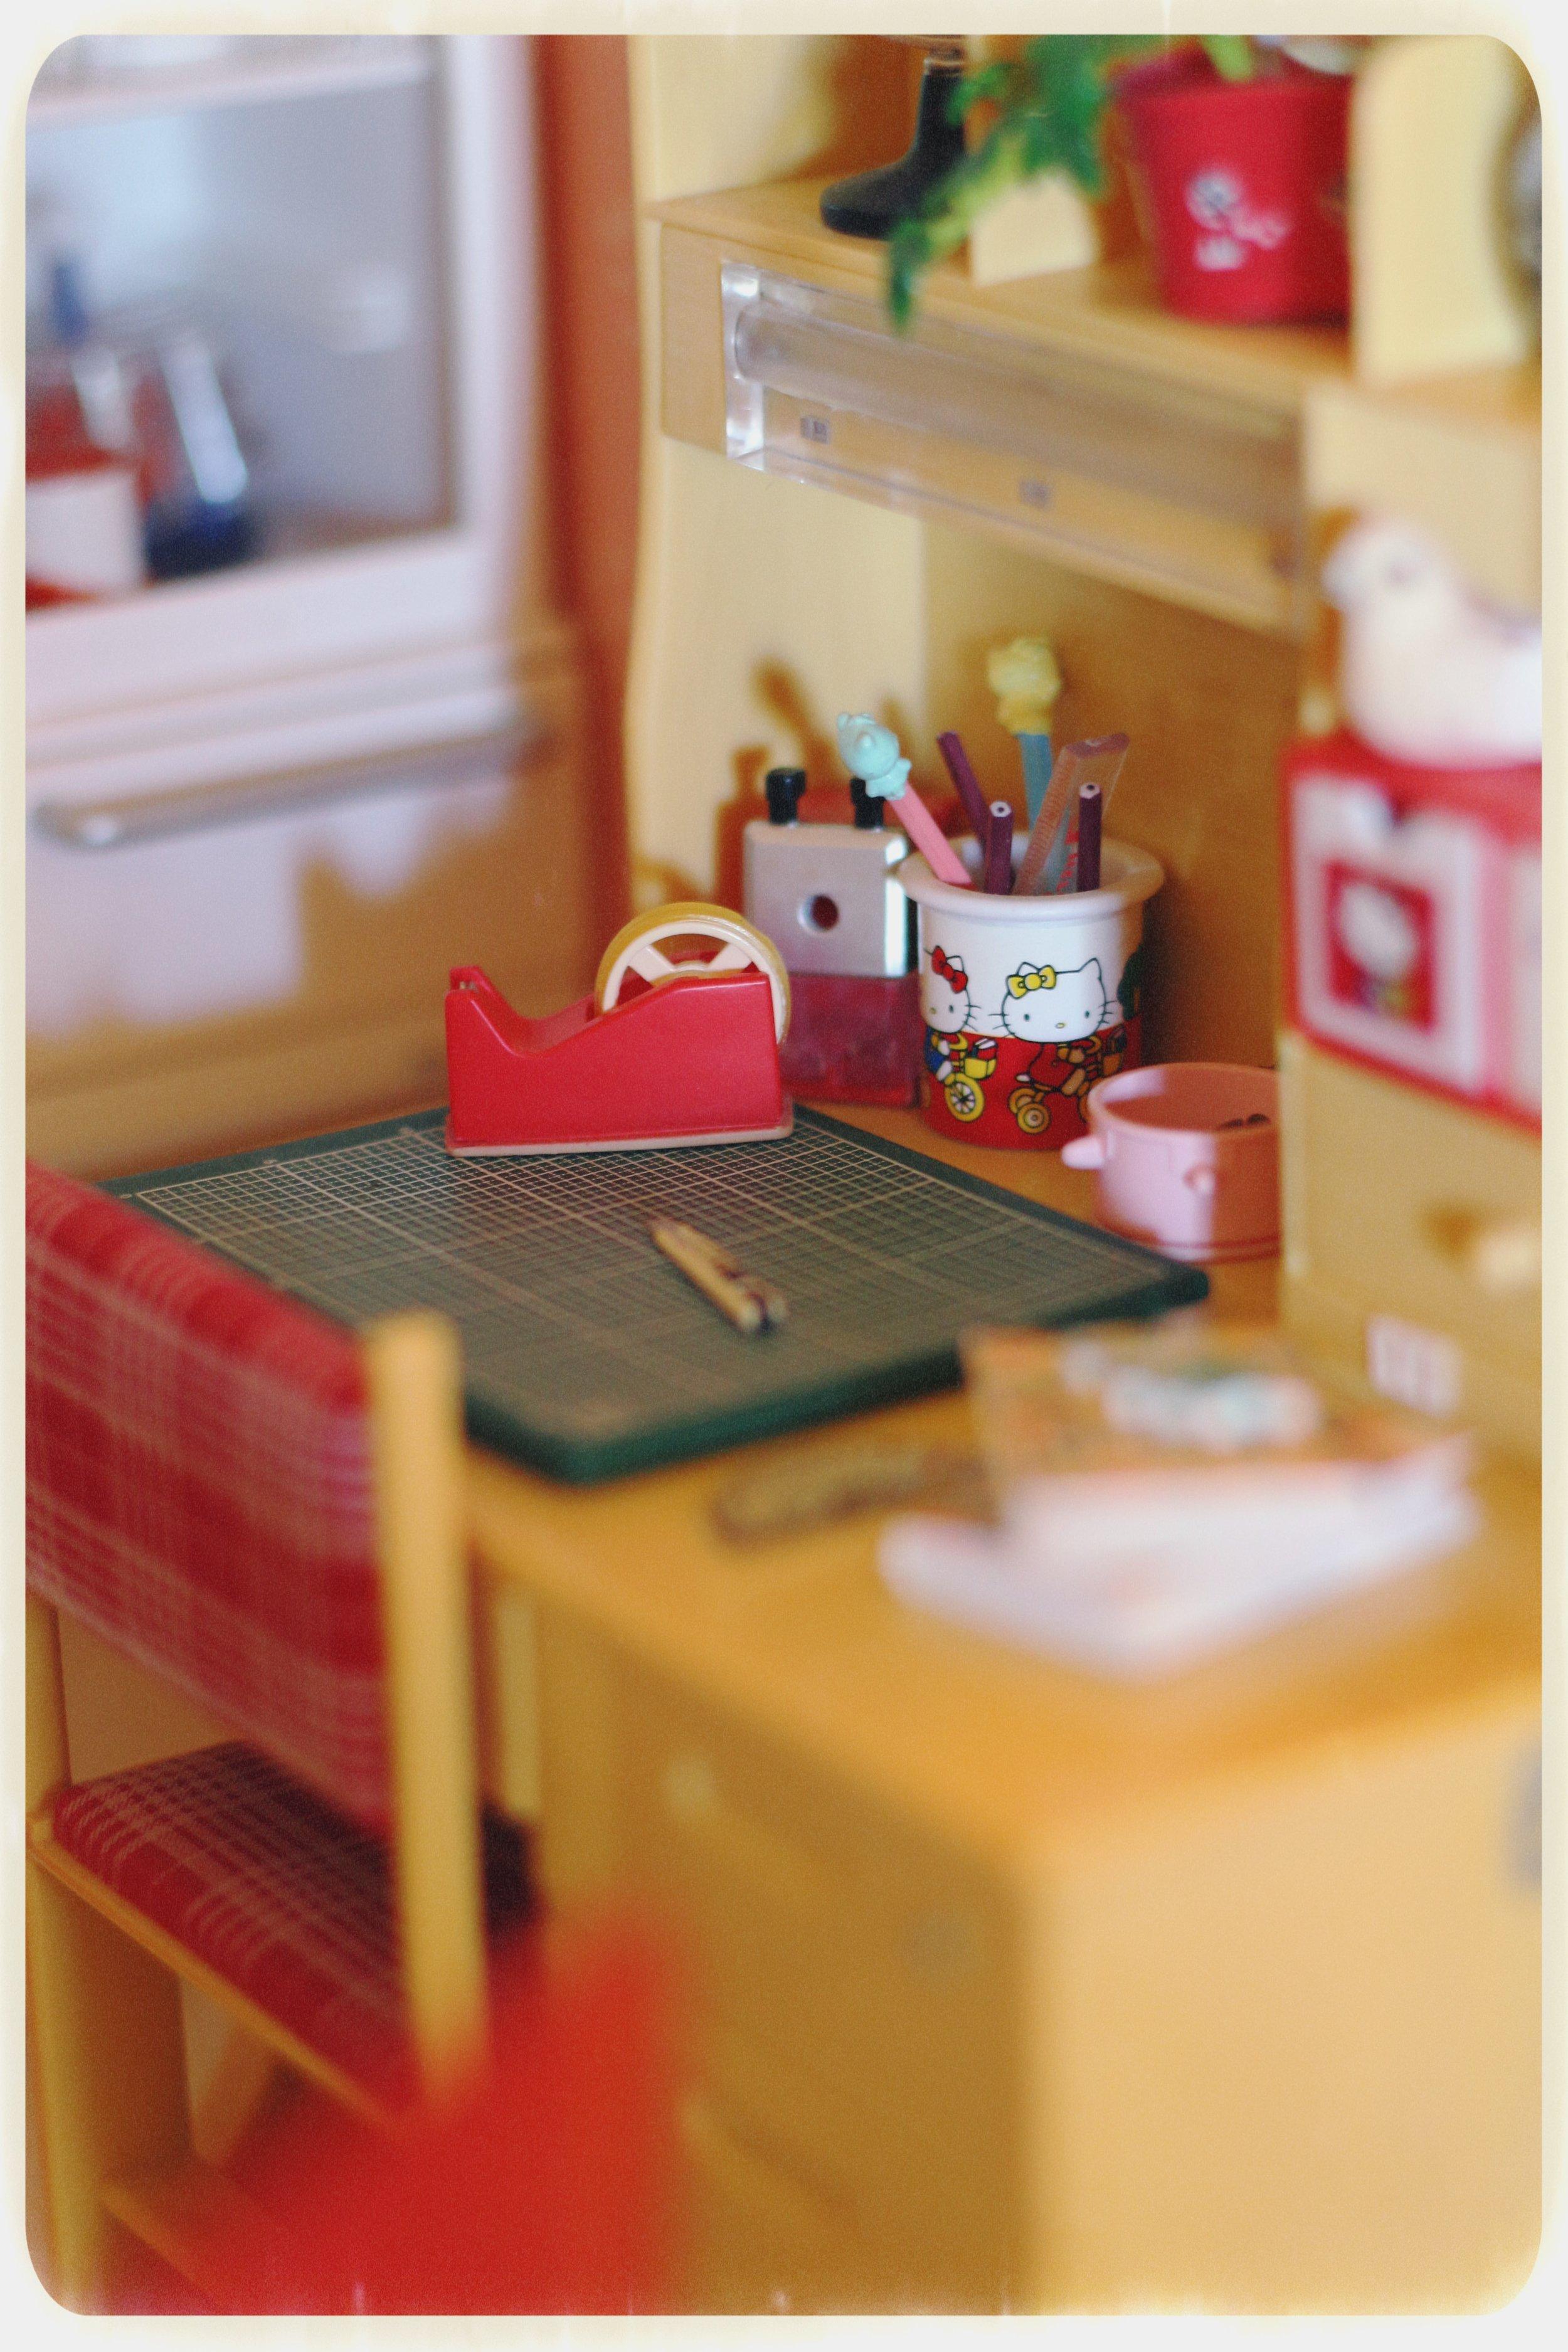 My mini-desk